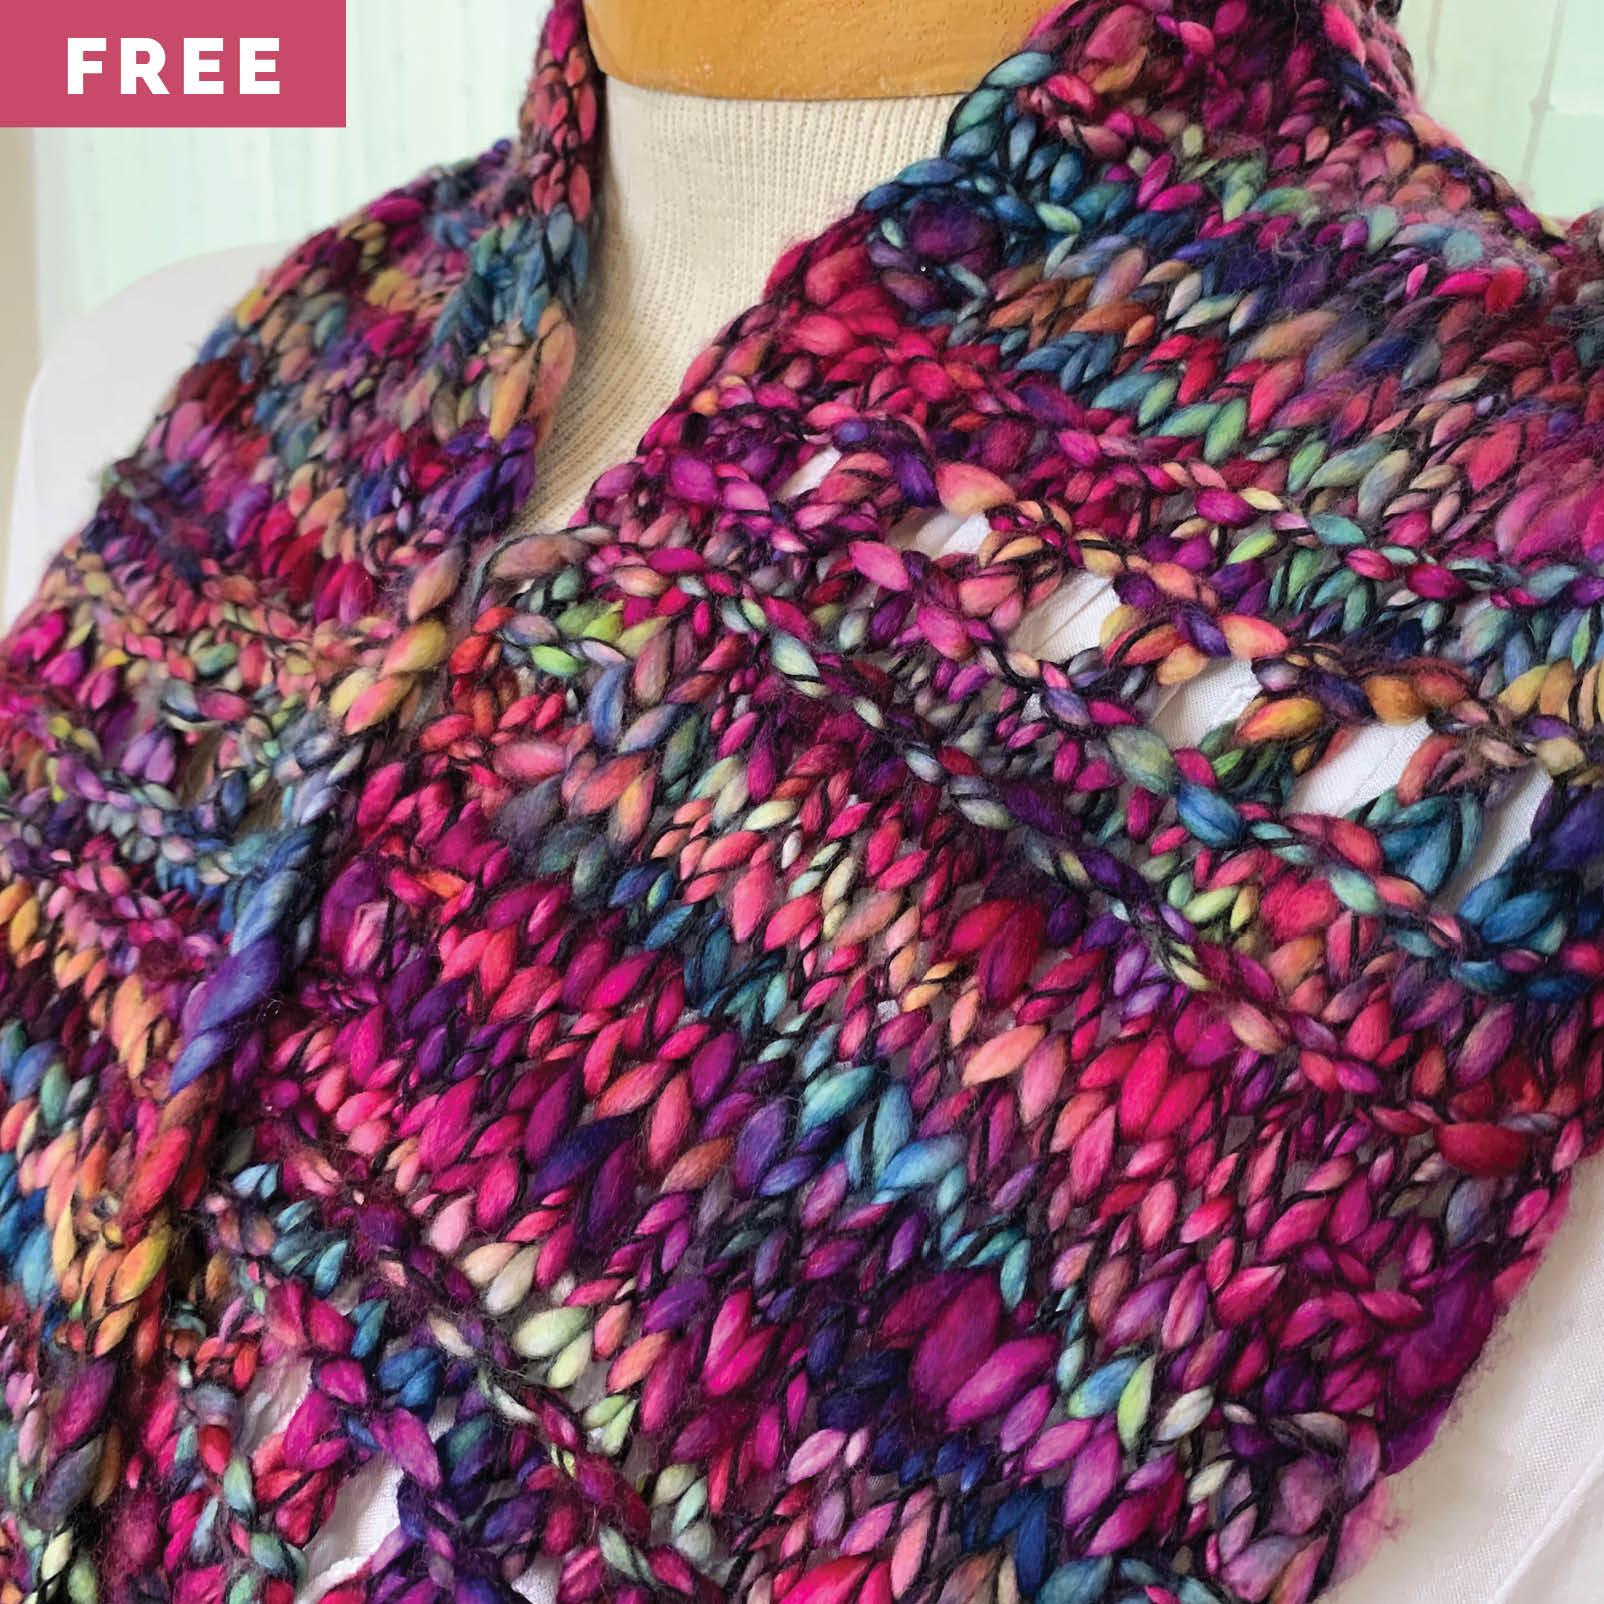 Free Knitting Pattern - Cozy Cowl